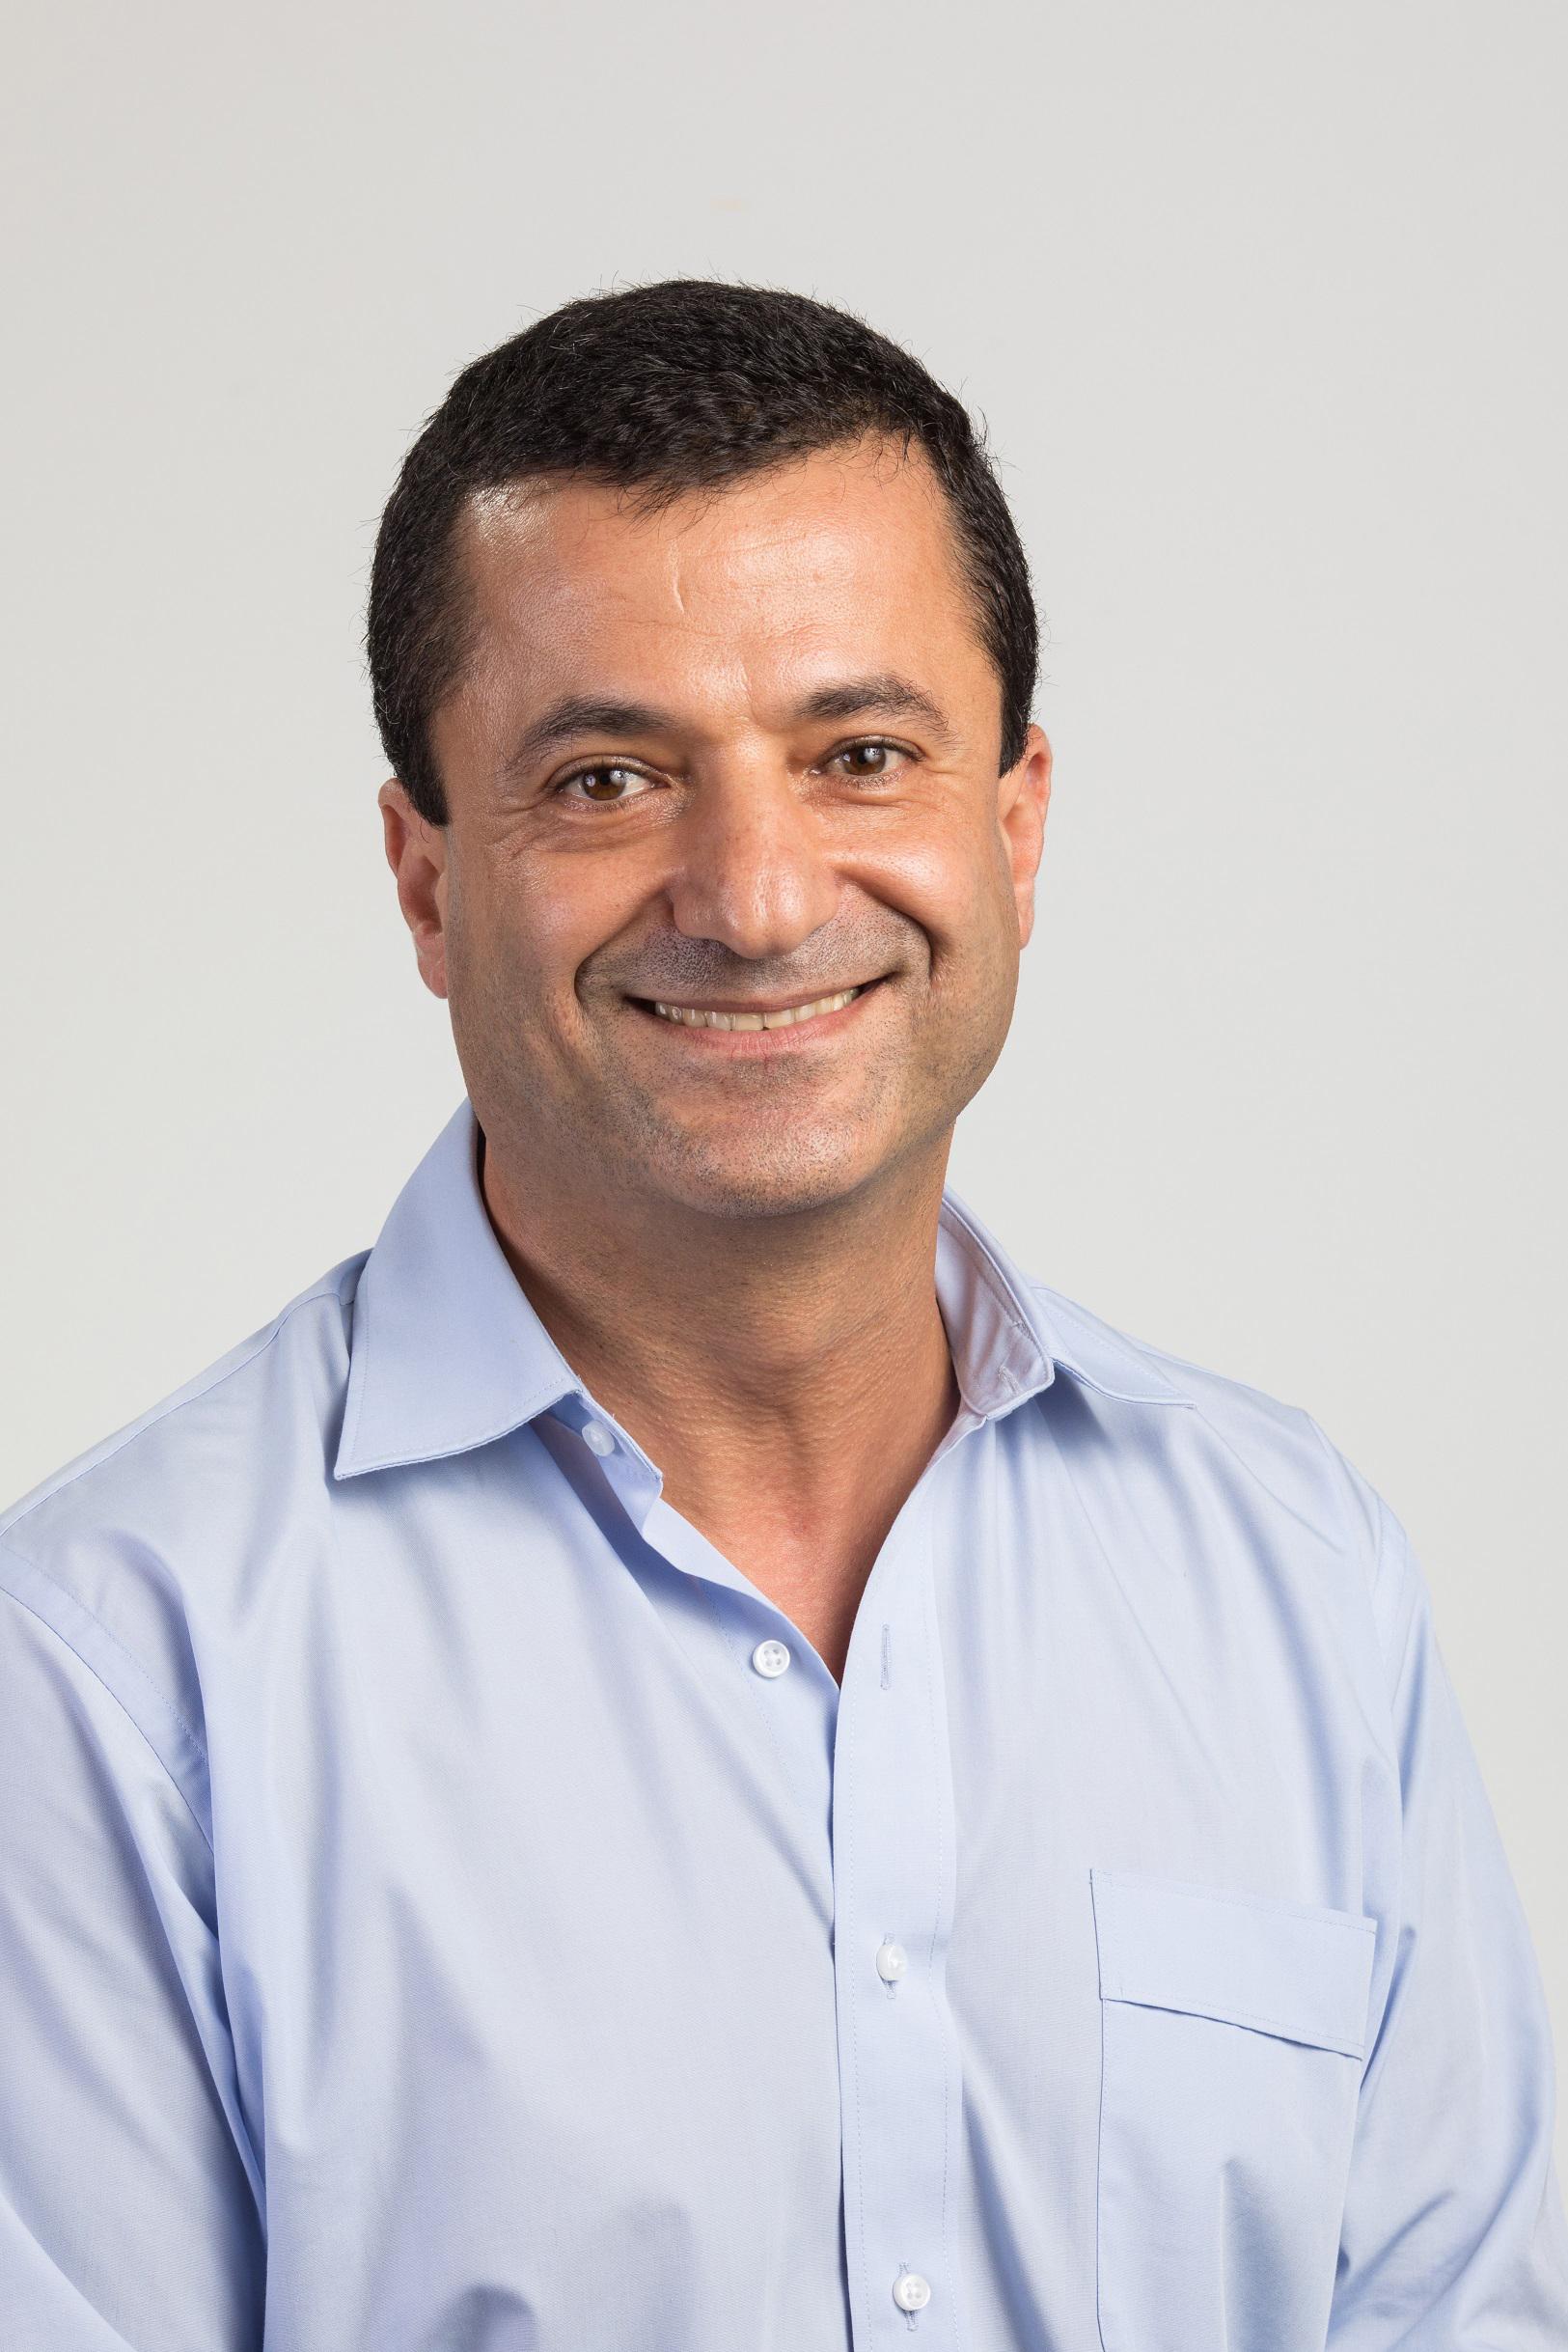 Ghassan.jpg